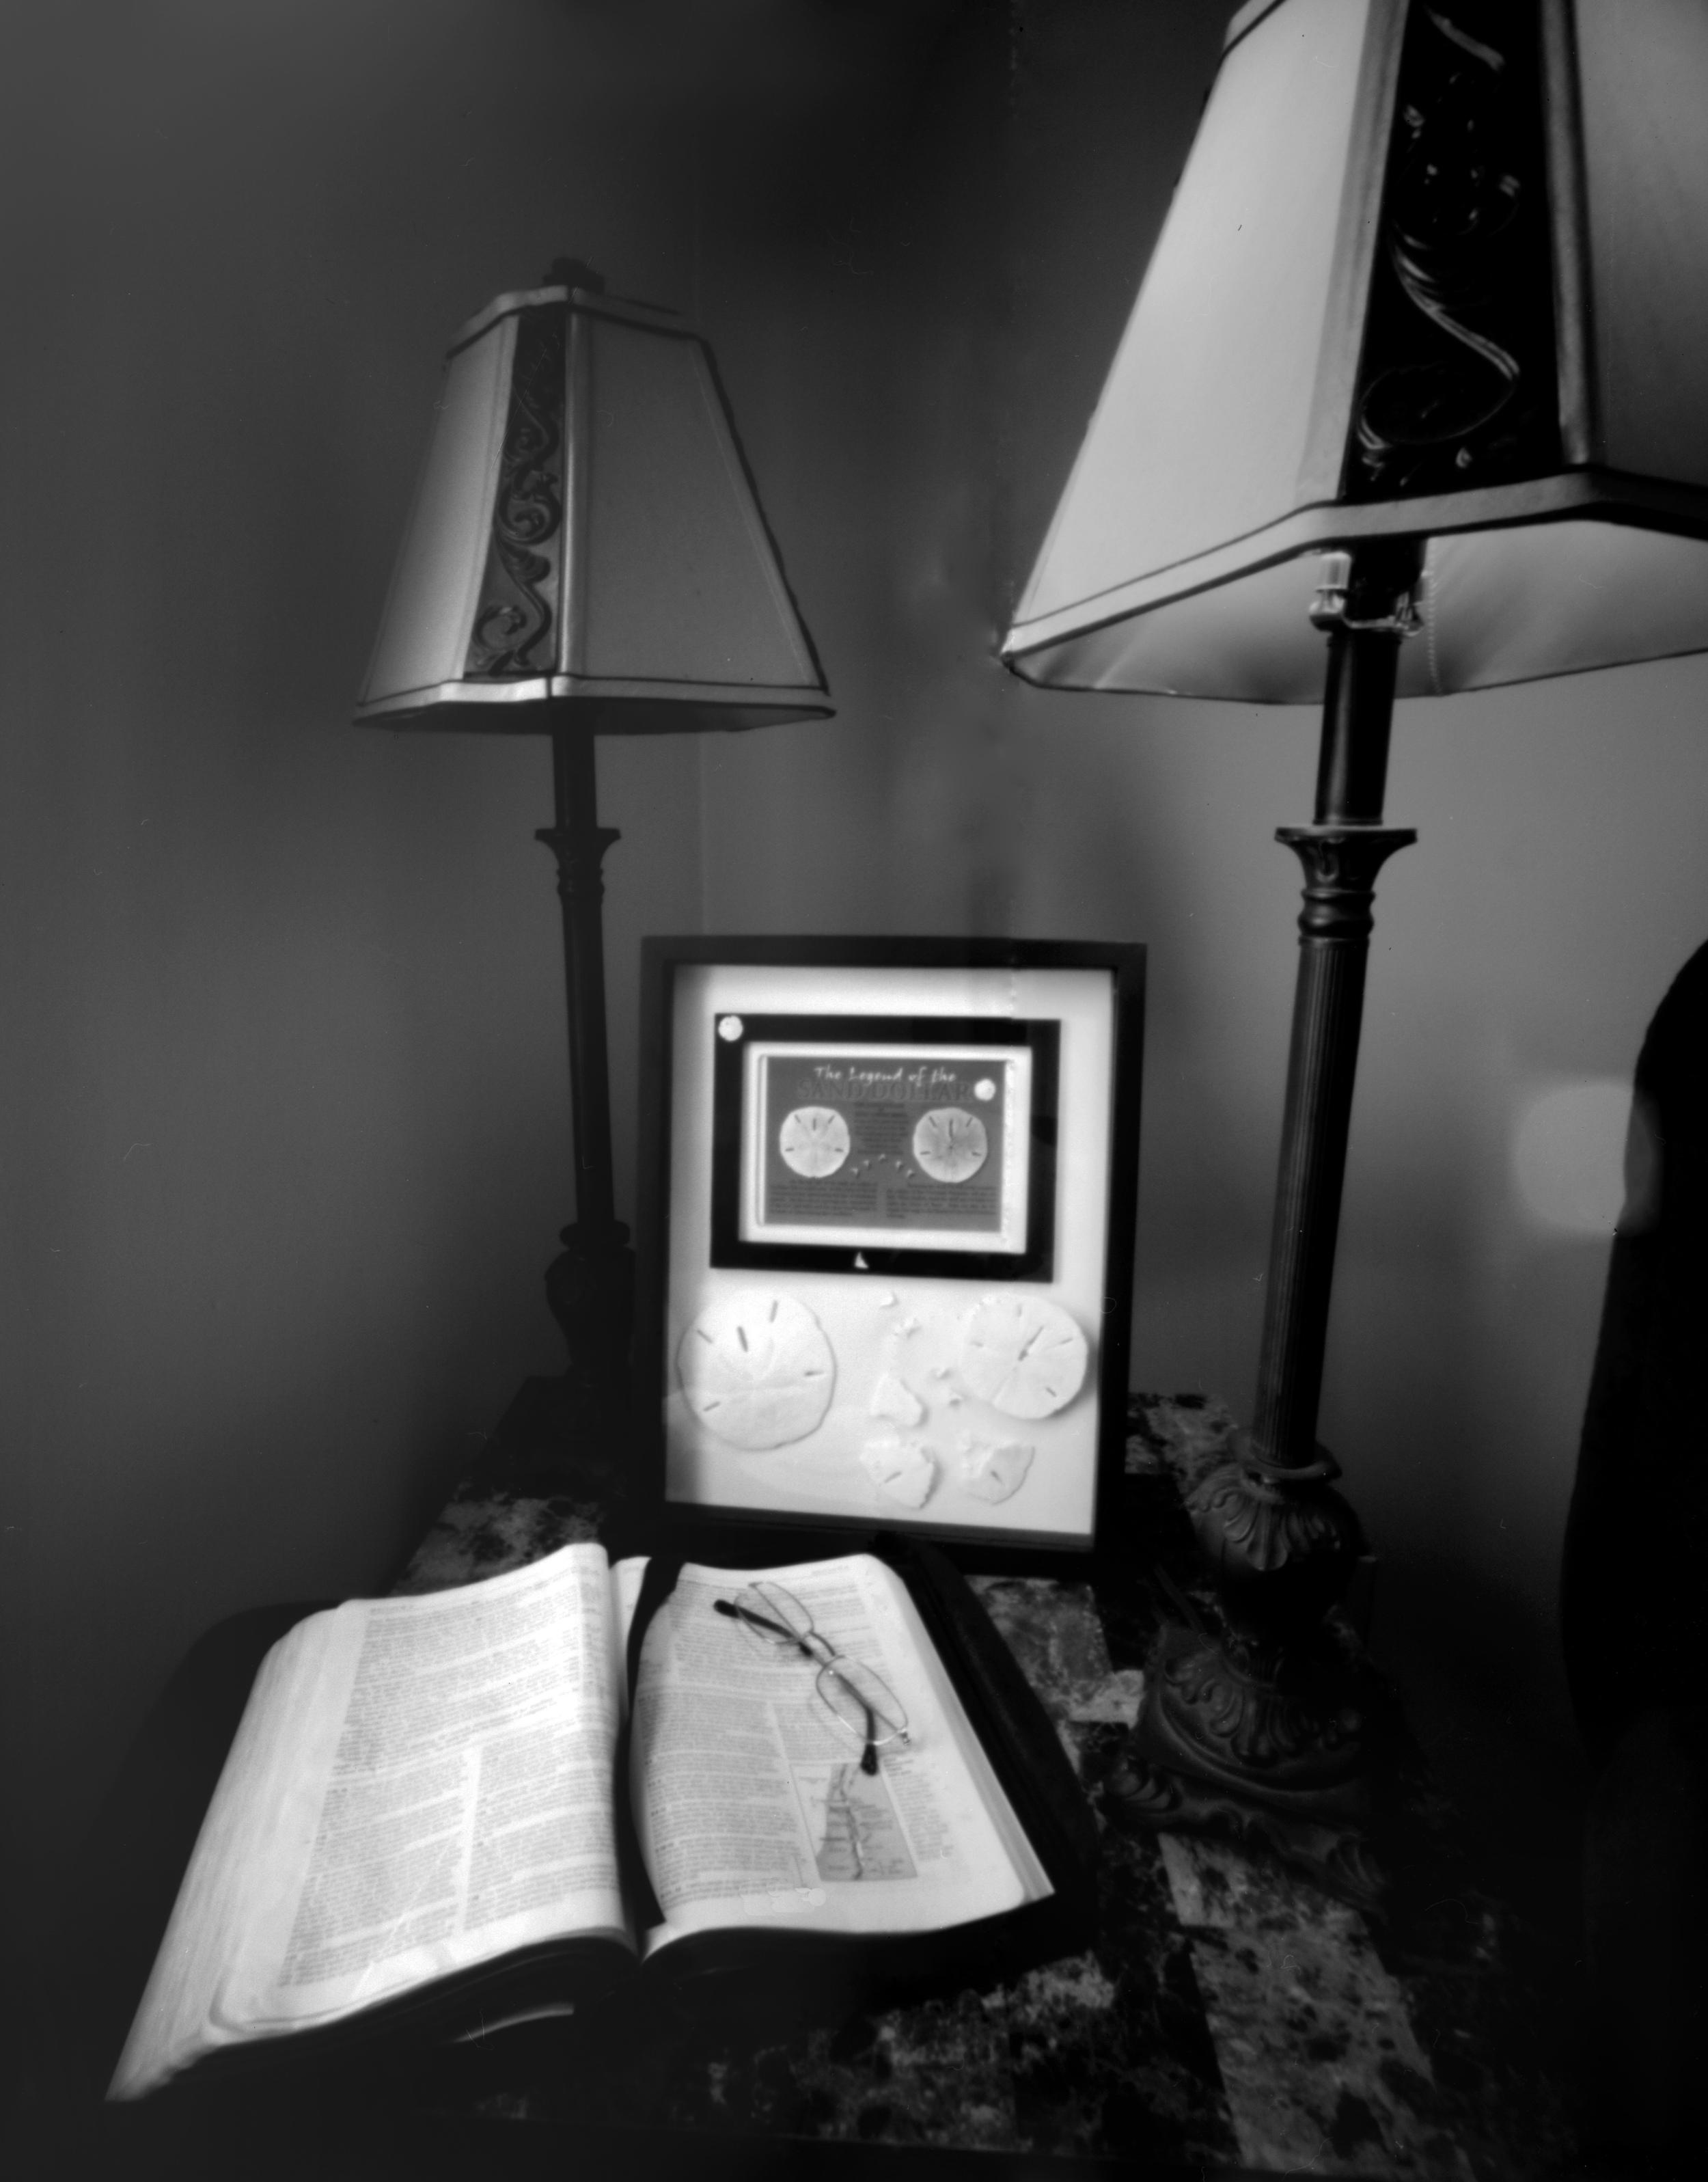 End Table | Delta 100, Lensless camera co. 4x5